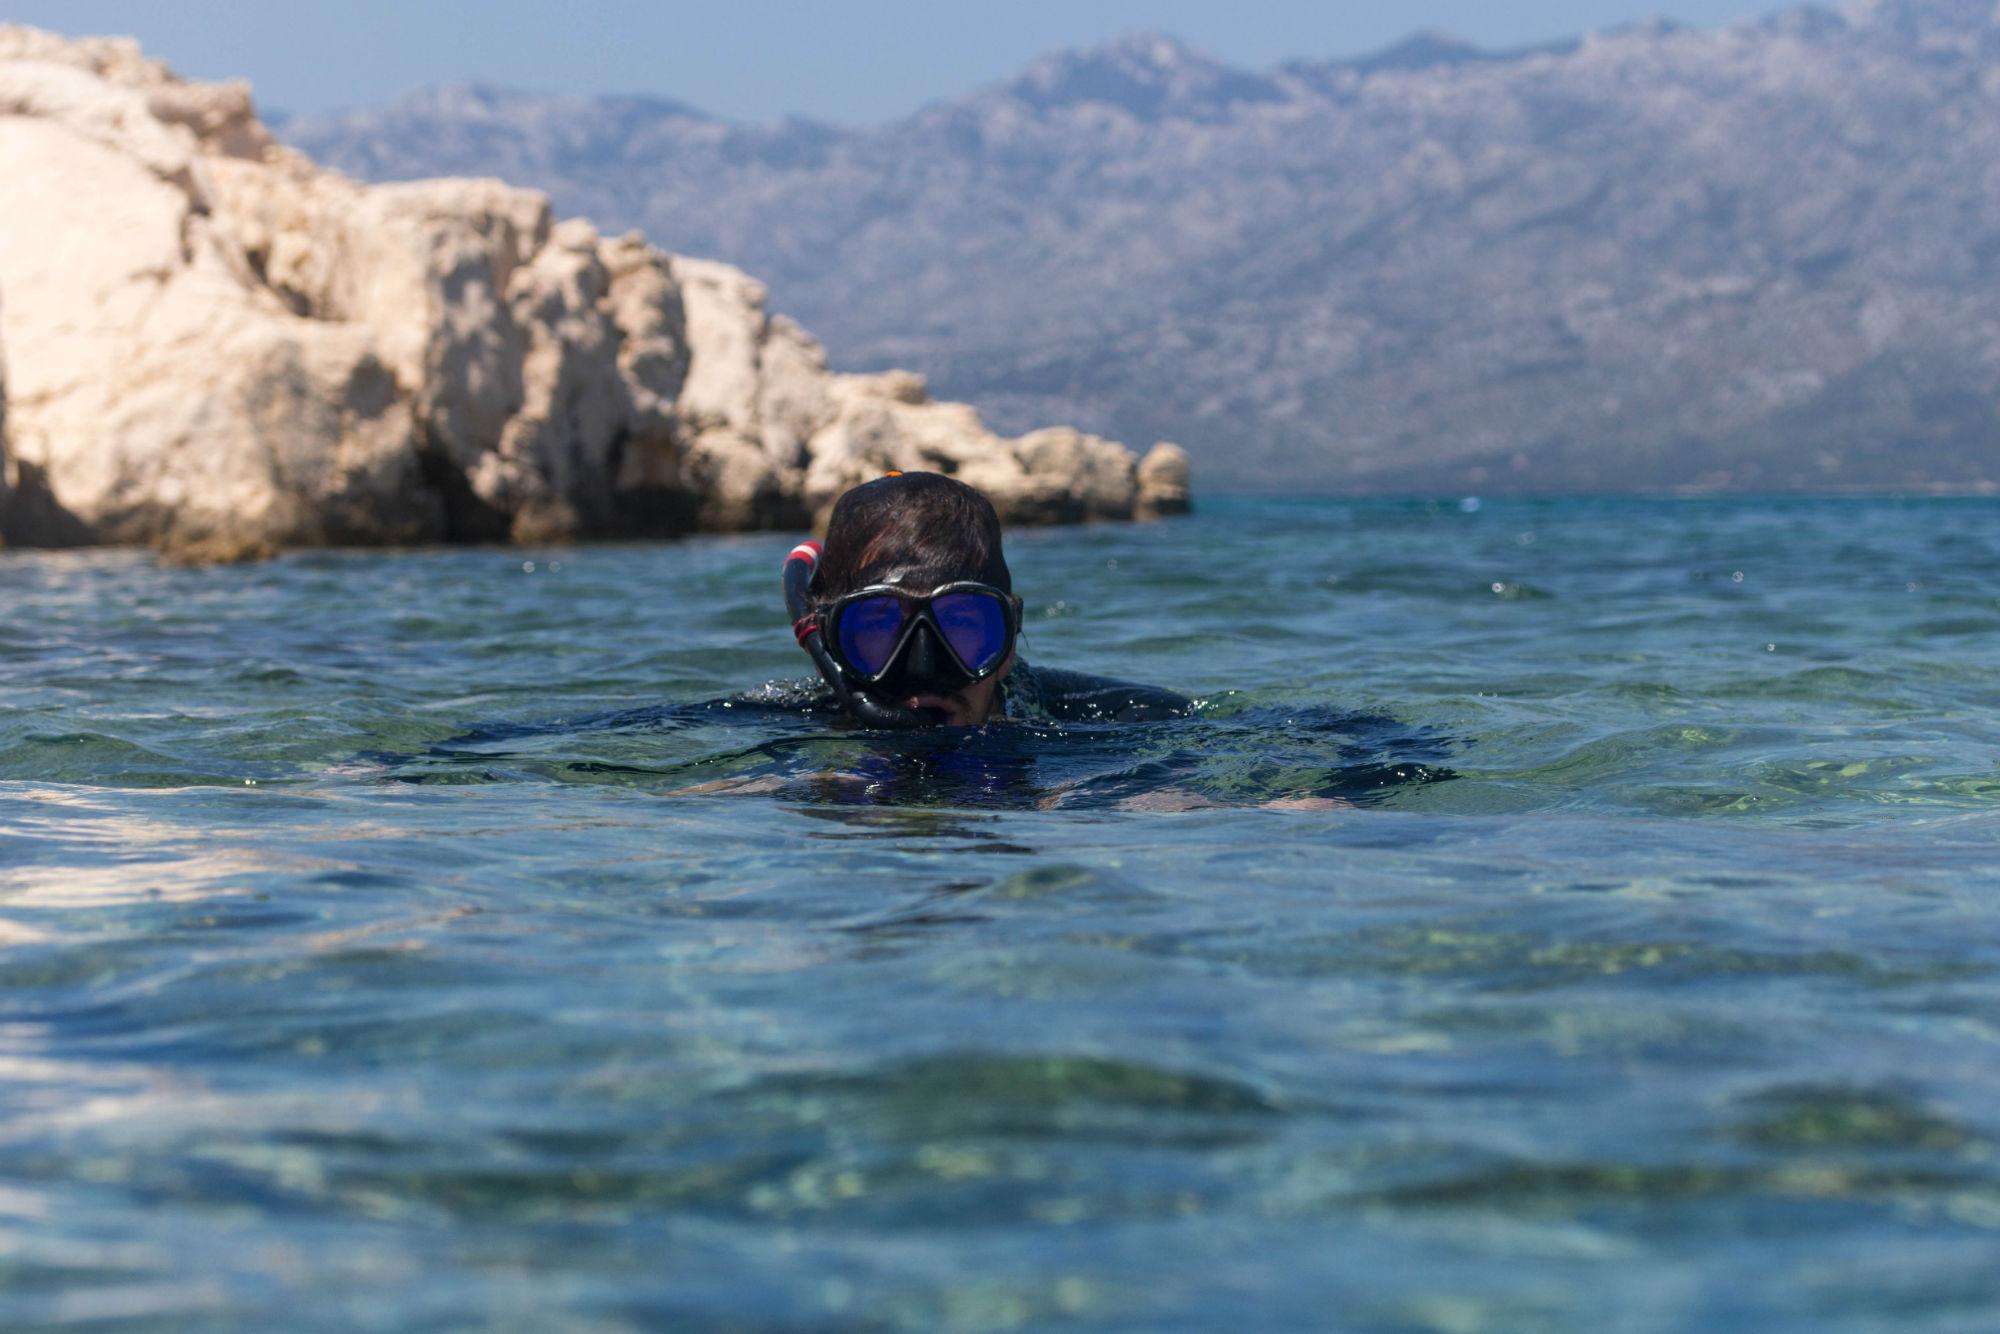 Joey Snorkeling The Dalmatian Coast In Croatia